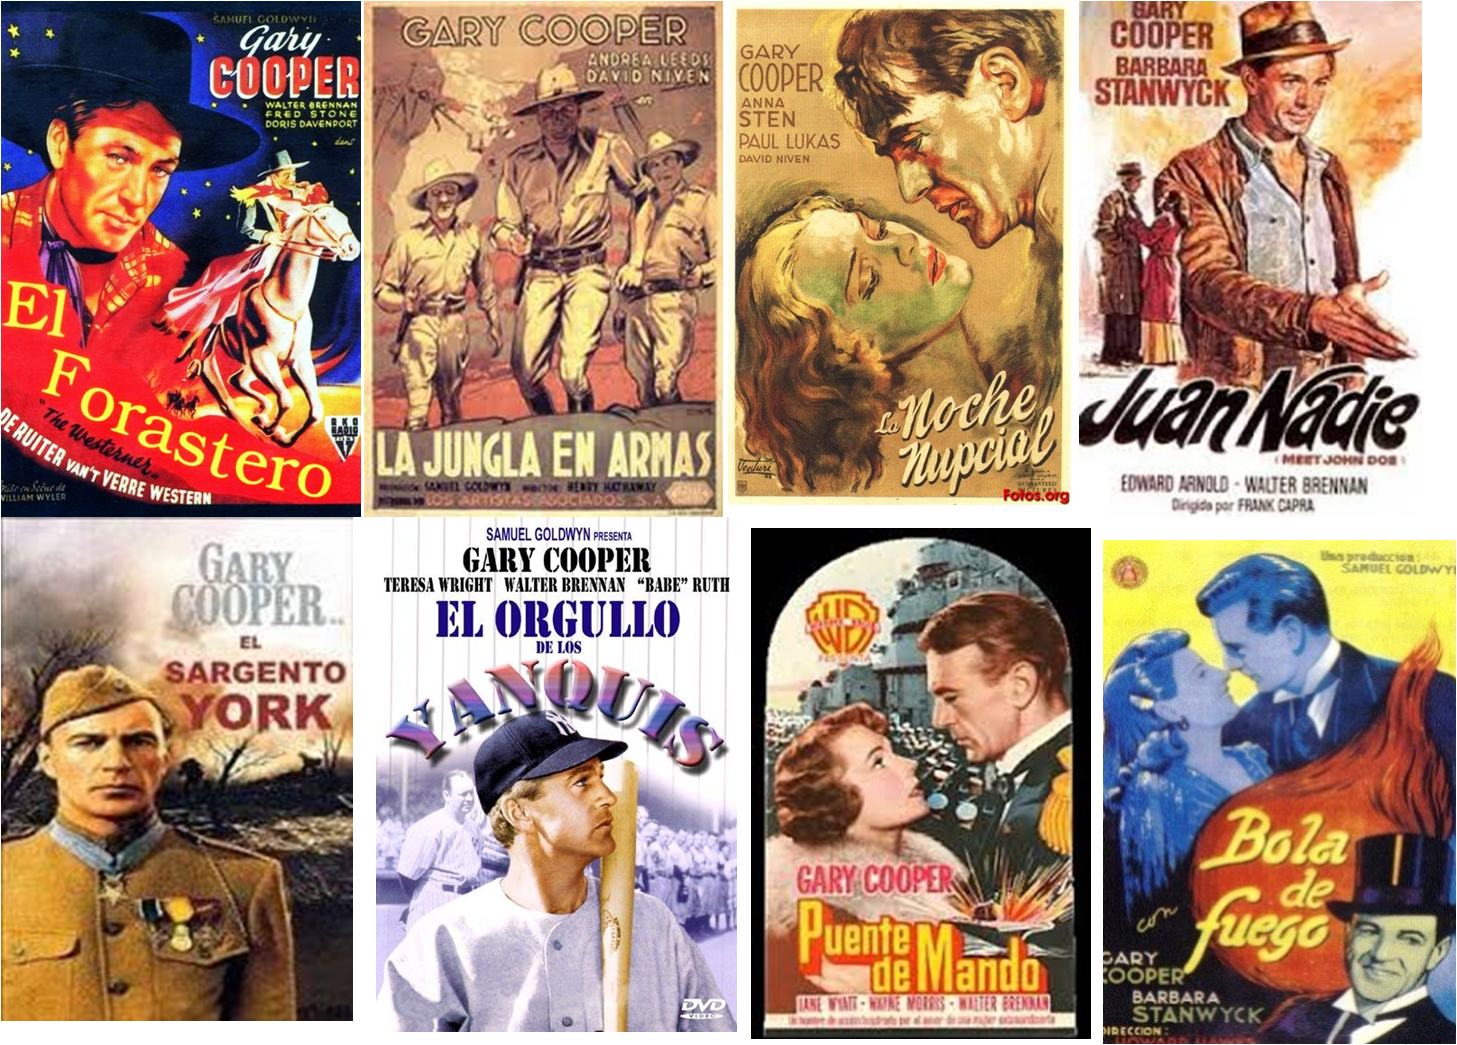 Gary Cooper afiche 2